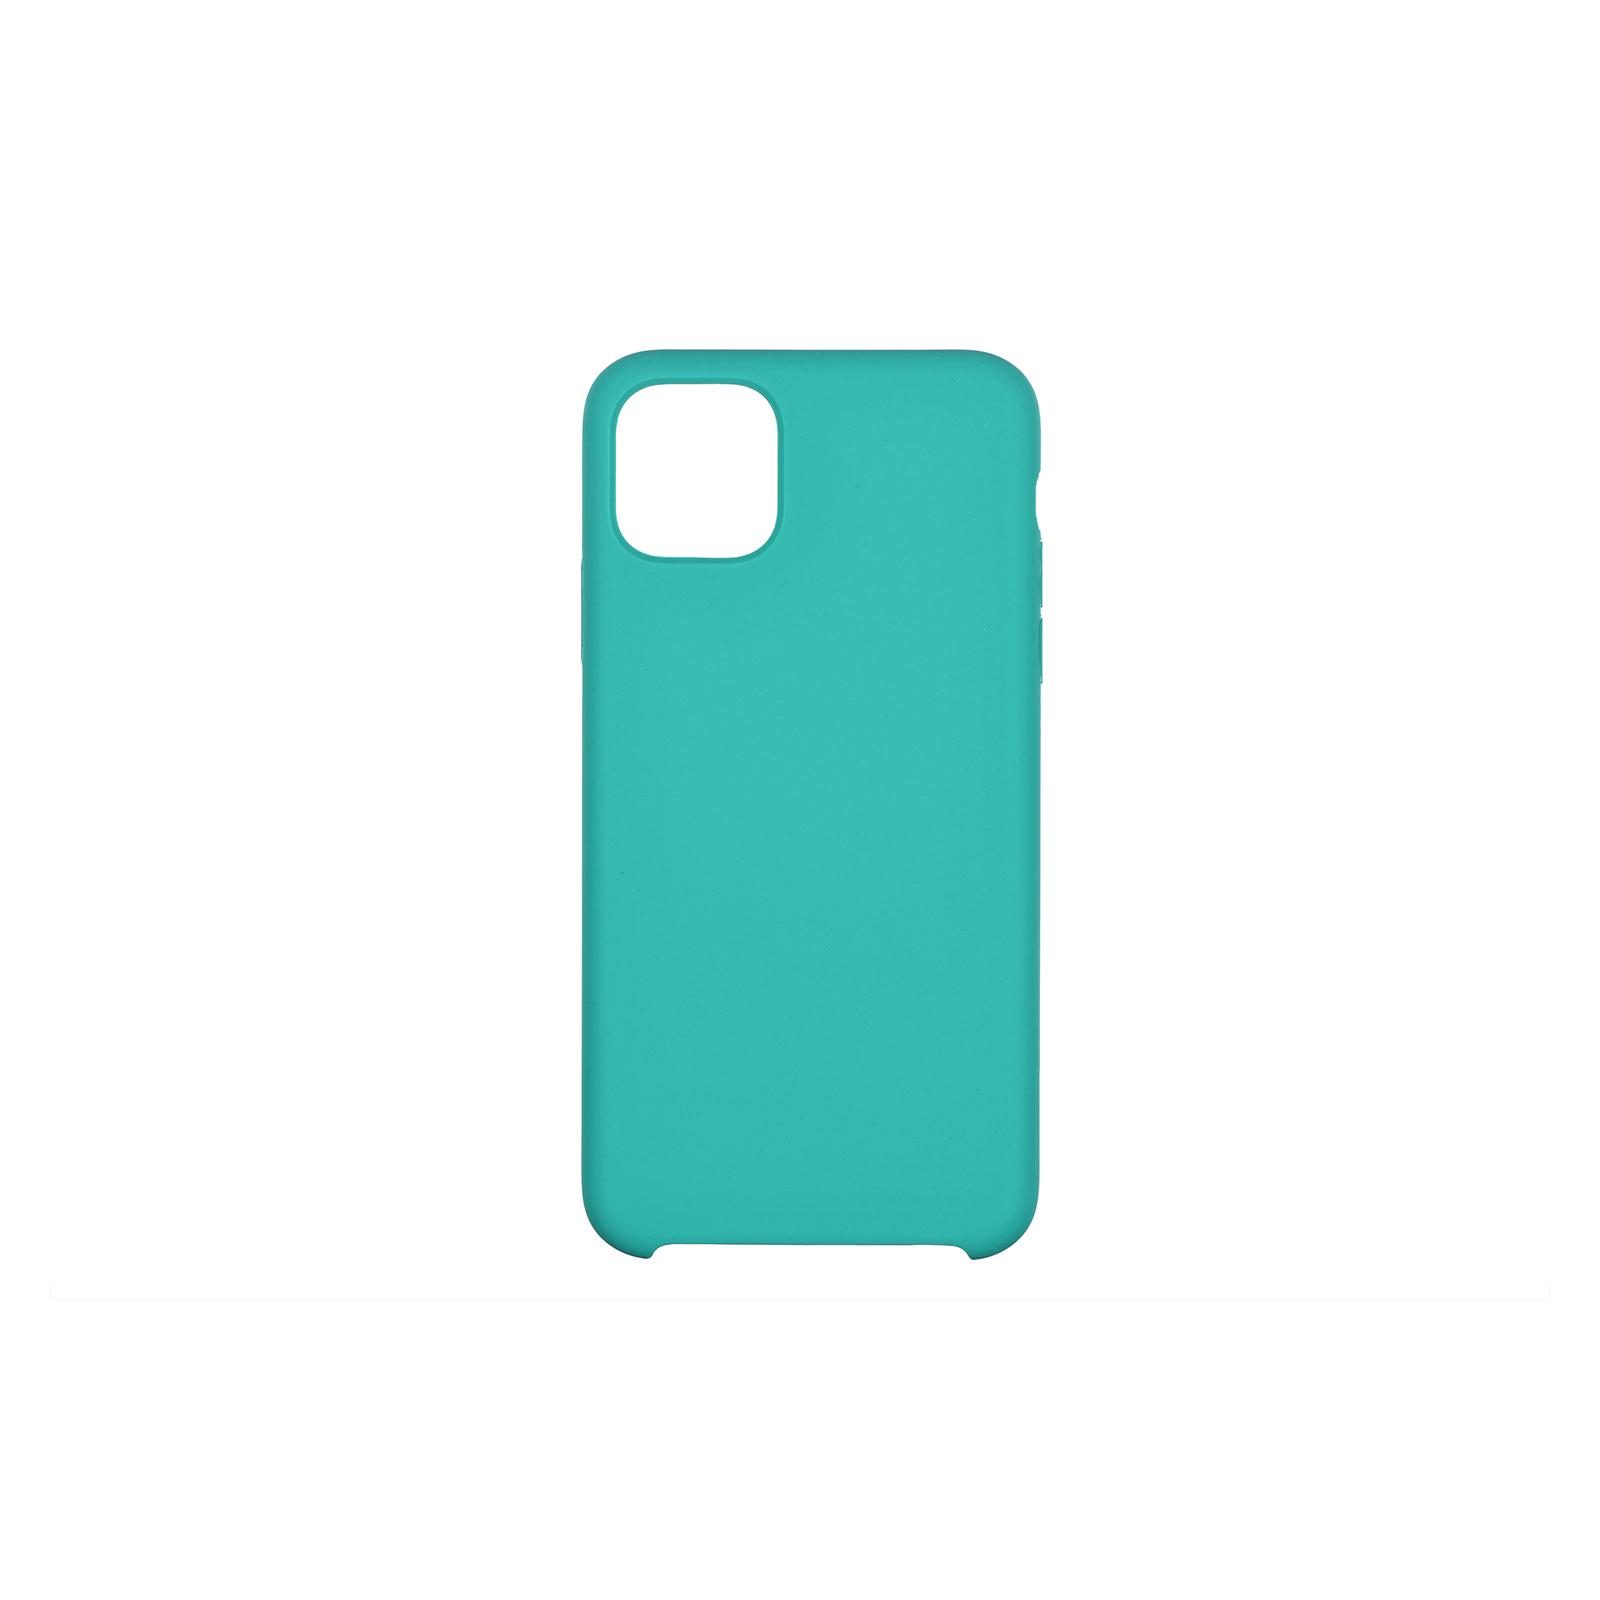 "Чехол для моб. телефона 2E Apple iPhone 11 (6.1""), Liquid Silicone, Dark Green (2E-IPH-11-OCLS-DG)"